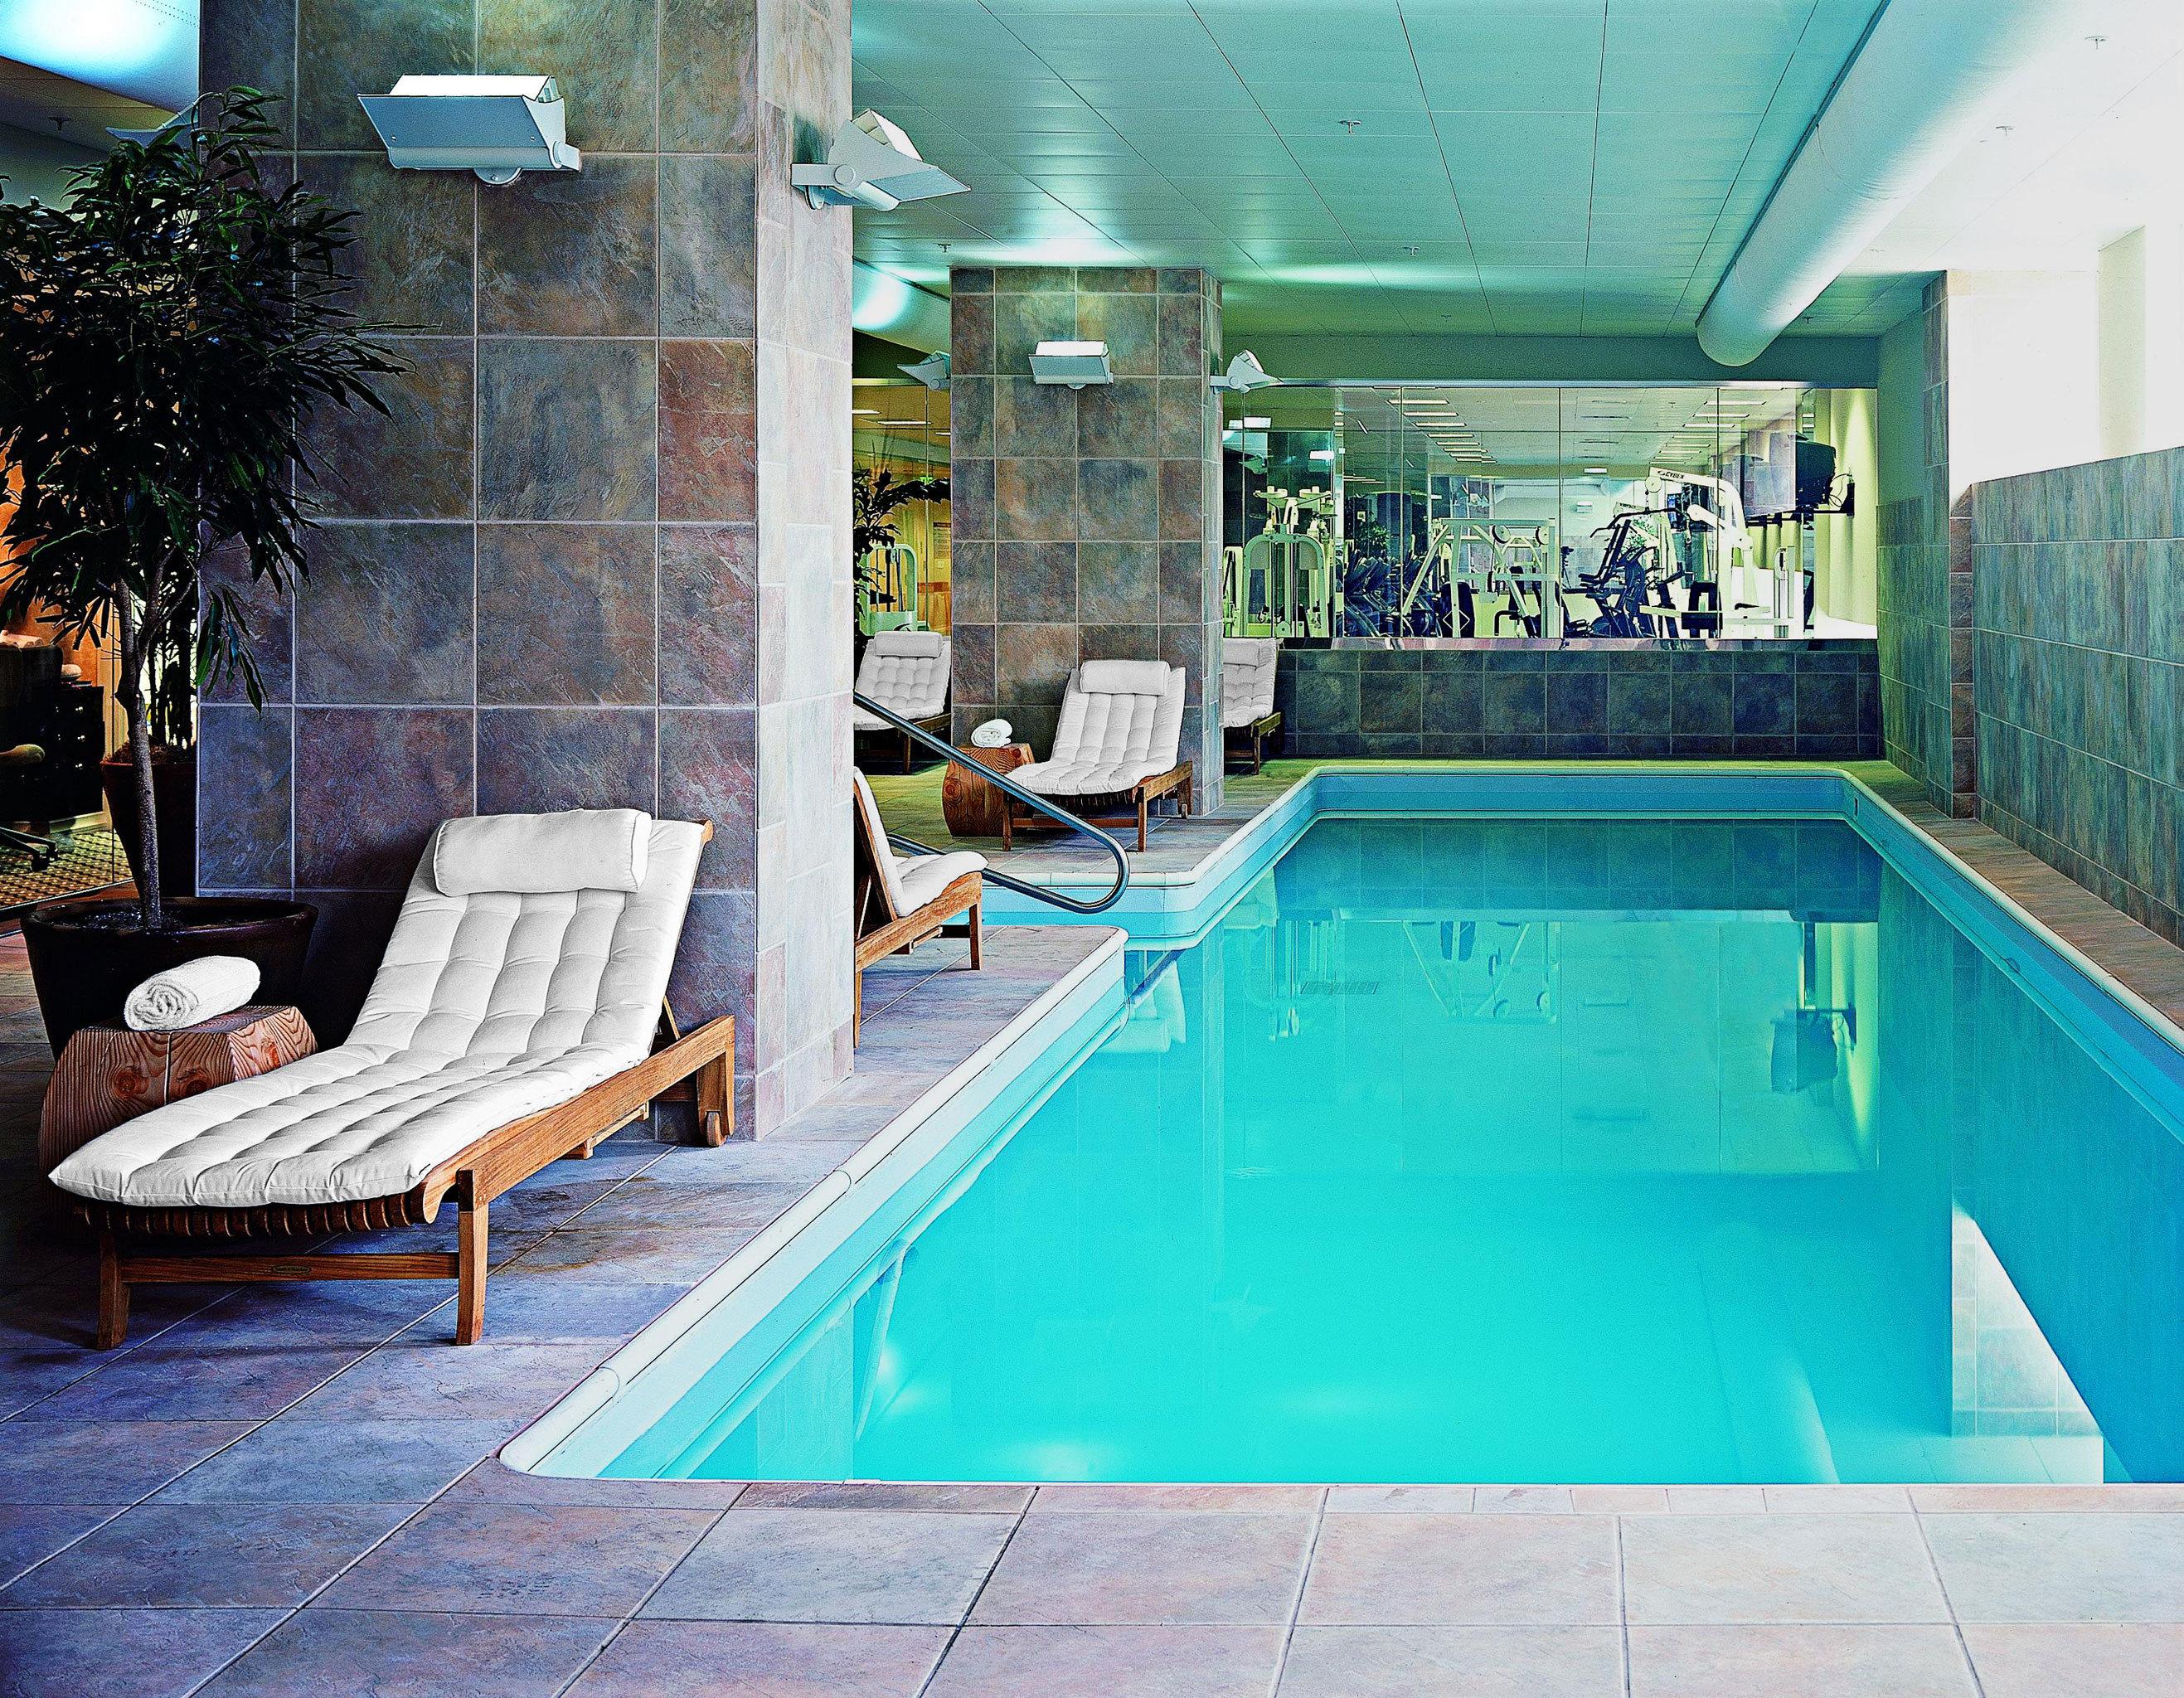 Lounge Pool swimming pool leisure property house green home blue Villa condominium Resort backyard mansion jacuzzi